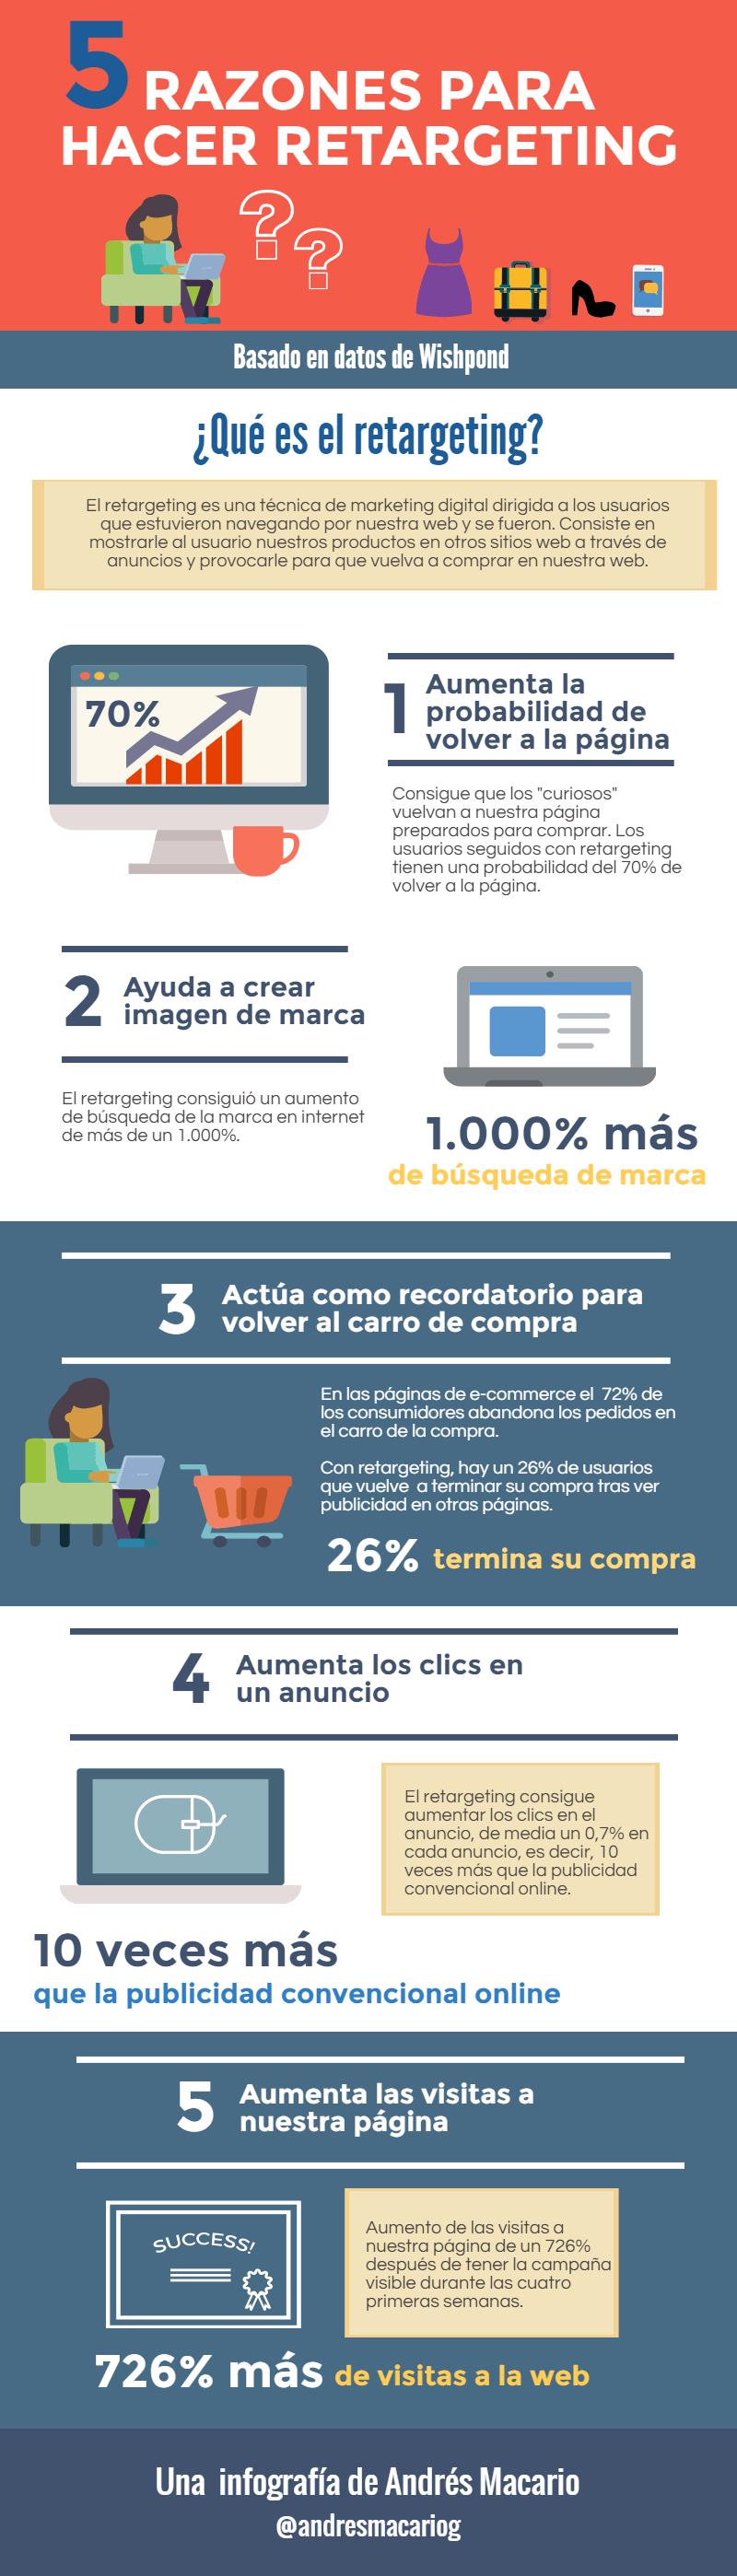 5-razones-para-hacer-retargeting-infografia-andres-macario